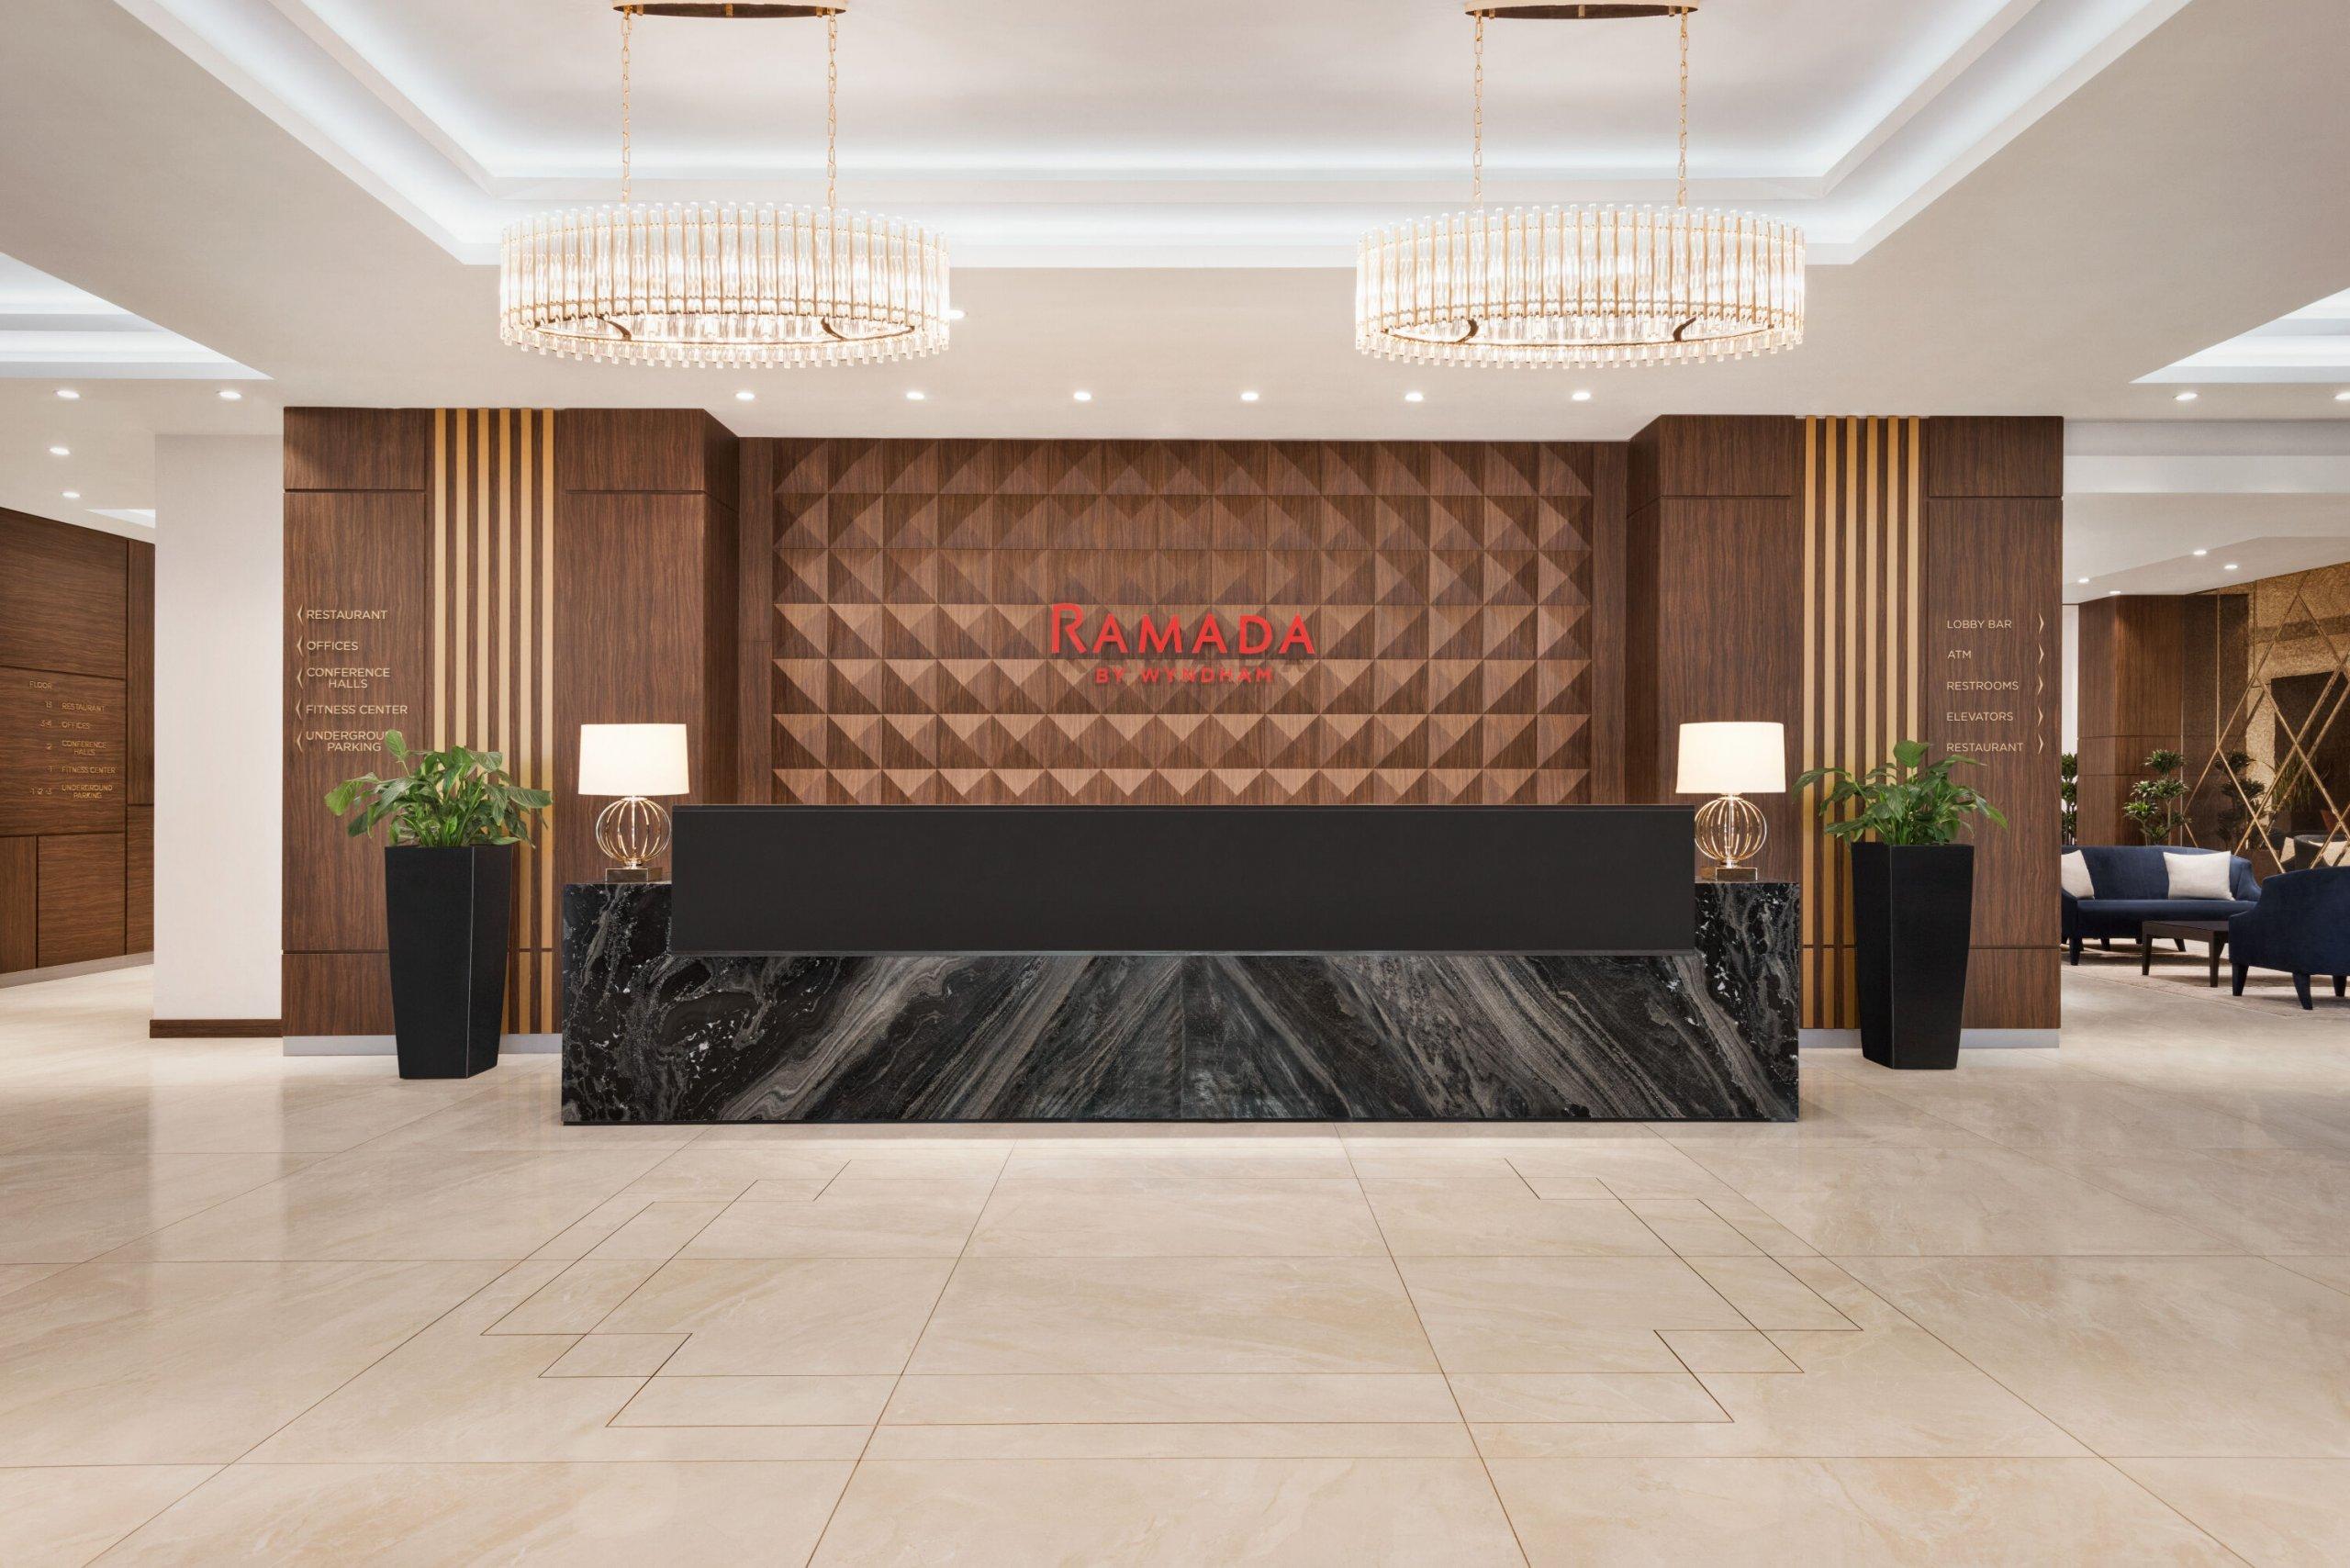 Quality Assurance Wyndham Hotels & Resorts